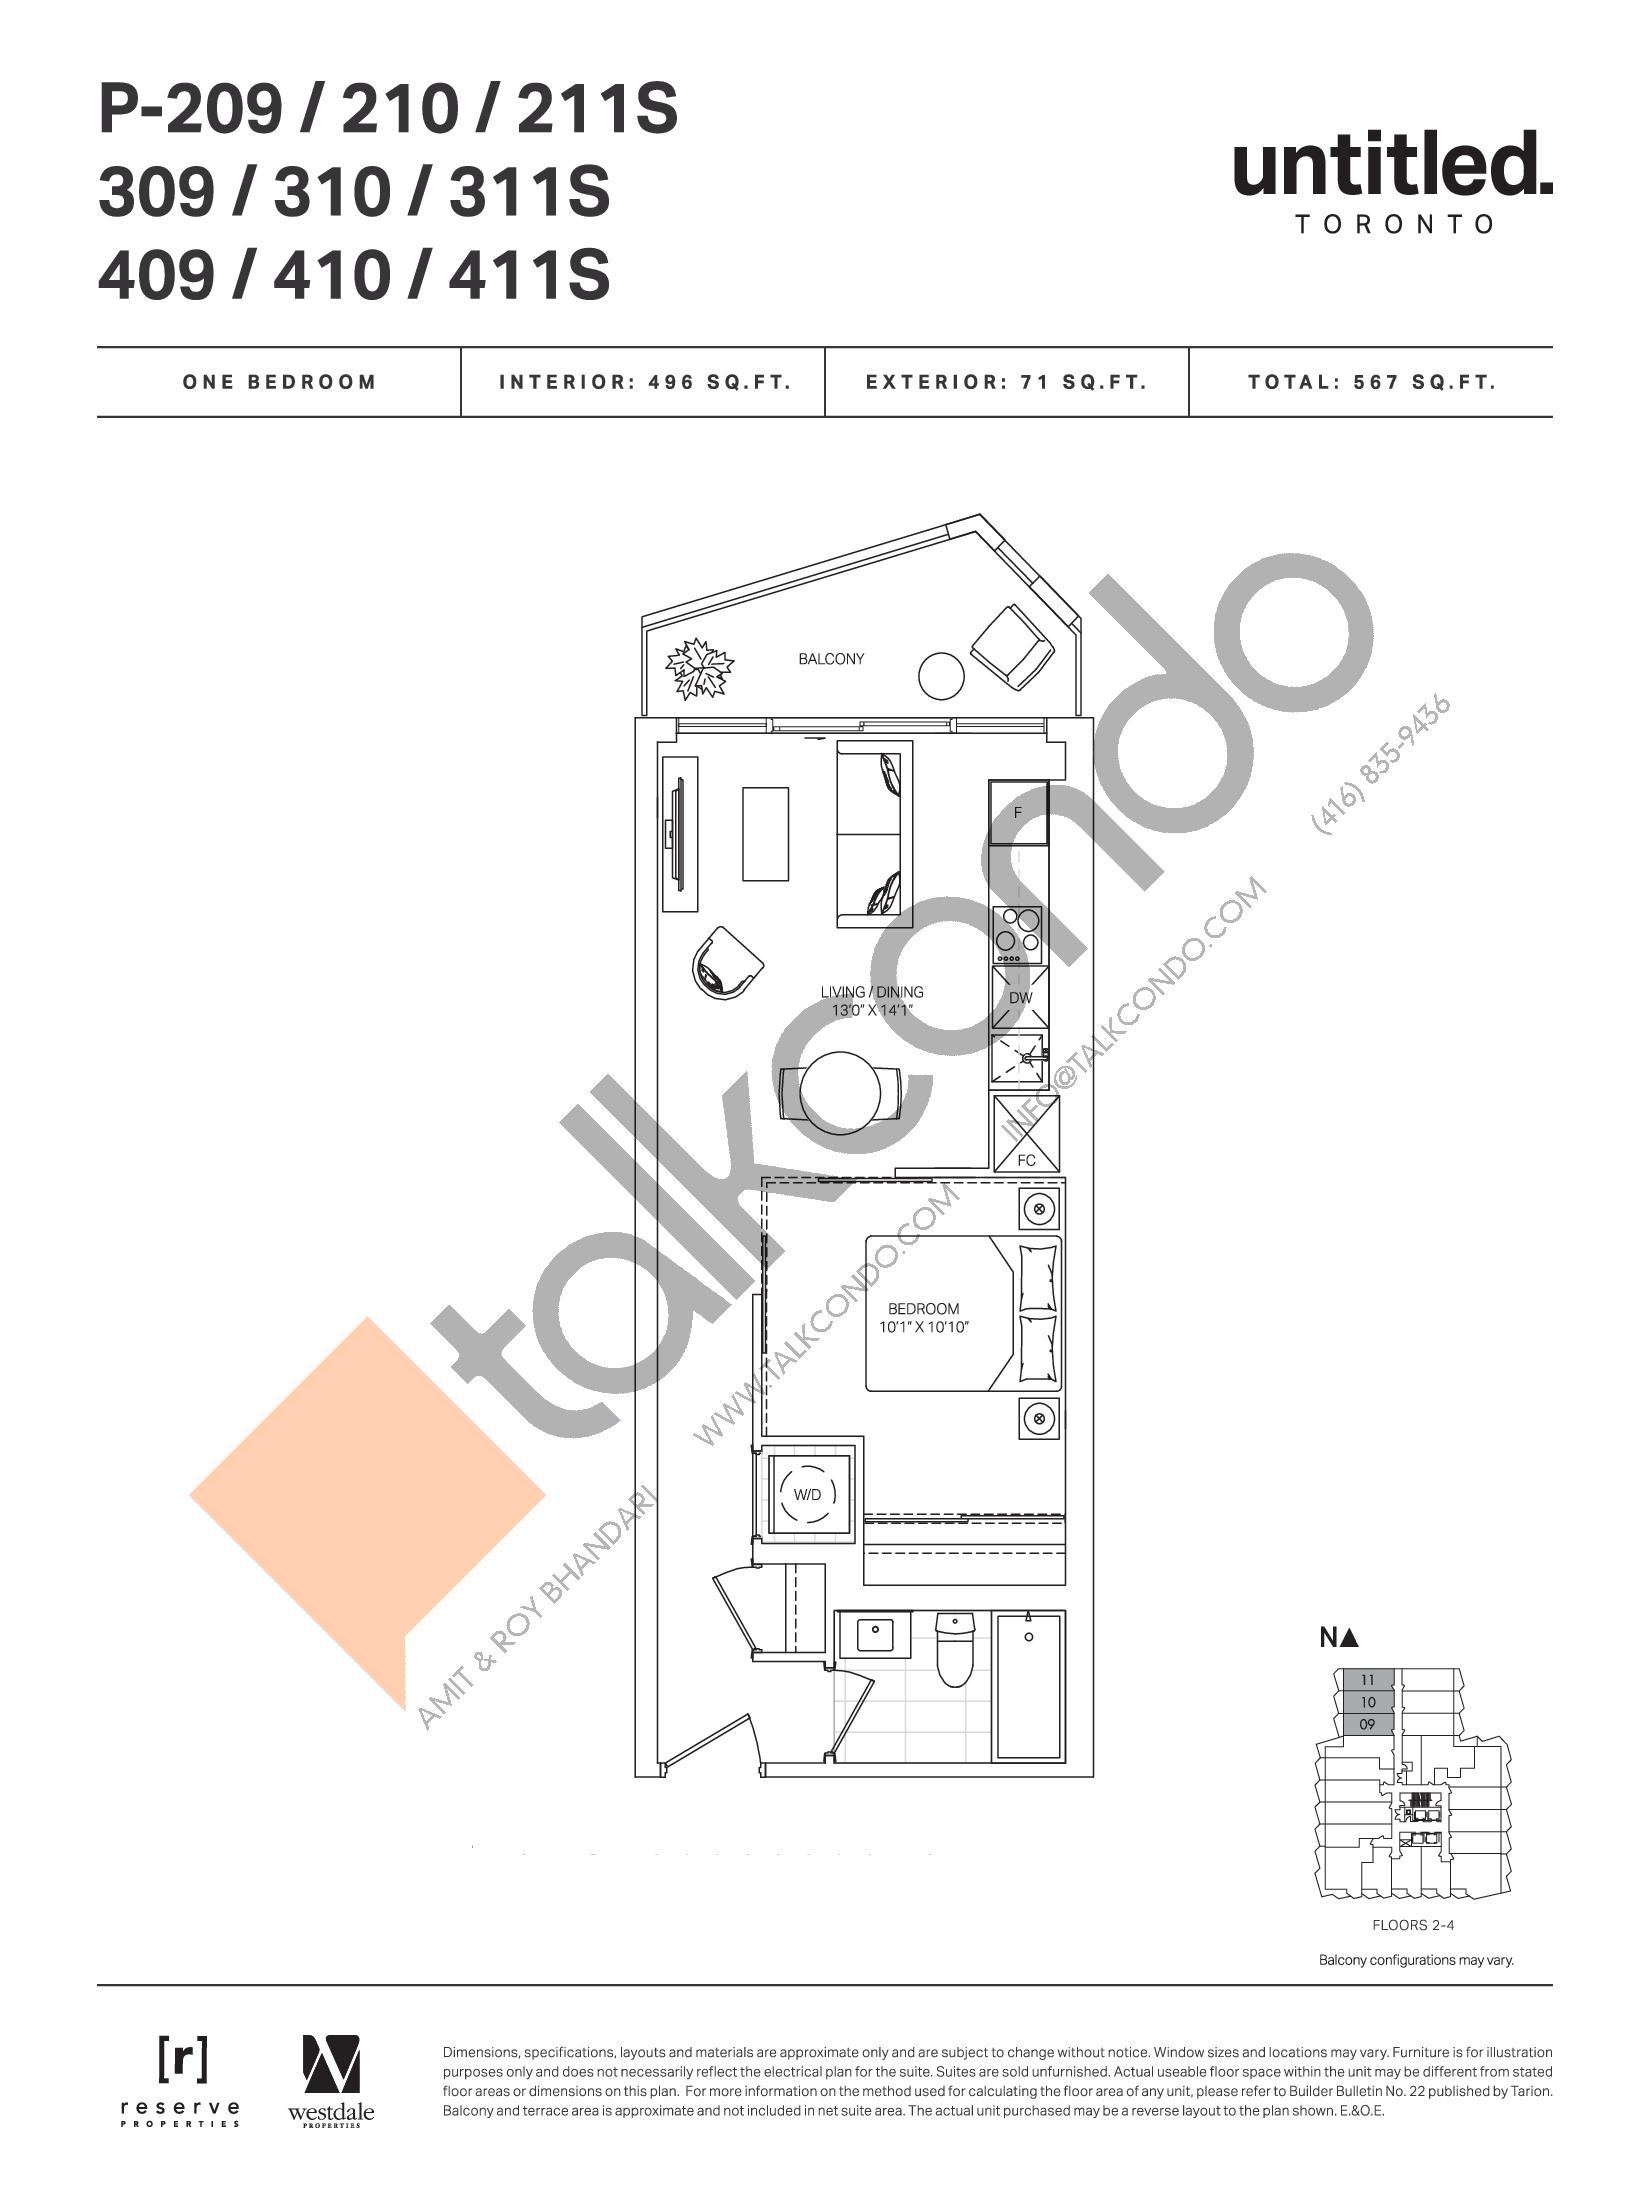 P-209 / 210 / 211S / 309 / 310 / 311S / 409 / 410 / 411S Floor Plan at Untitled Toronto Condos - 496 sq.ft